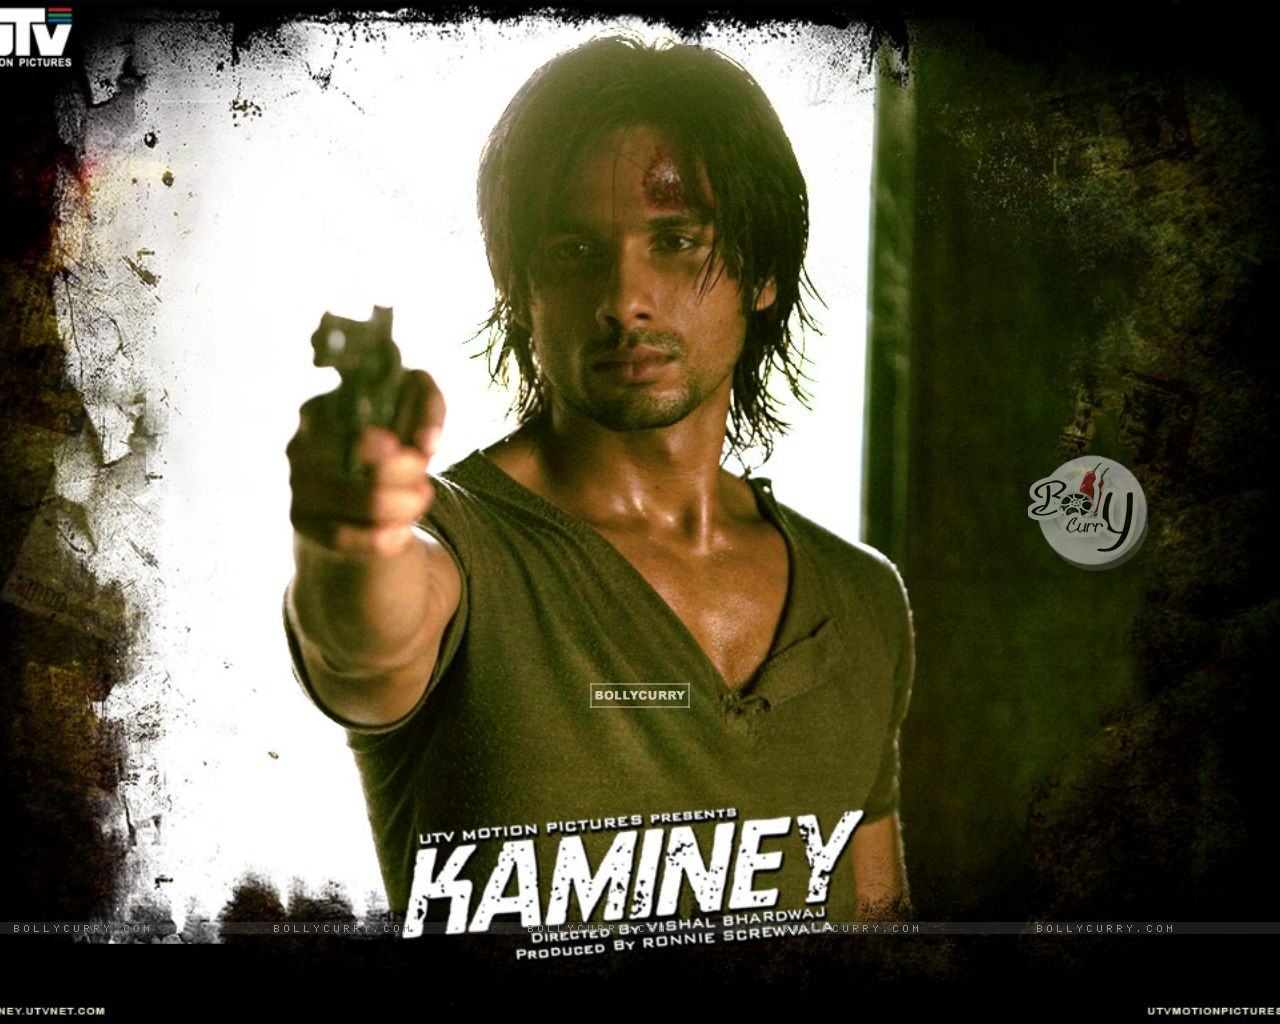 Shahid Kapoor holding a gun in movie Kaminey (20542) size:1280x1024